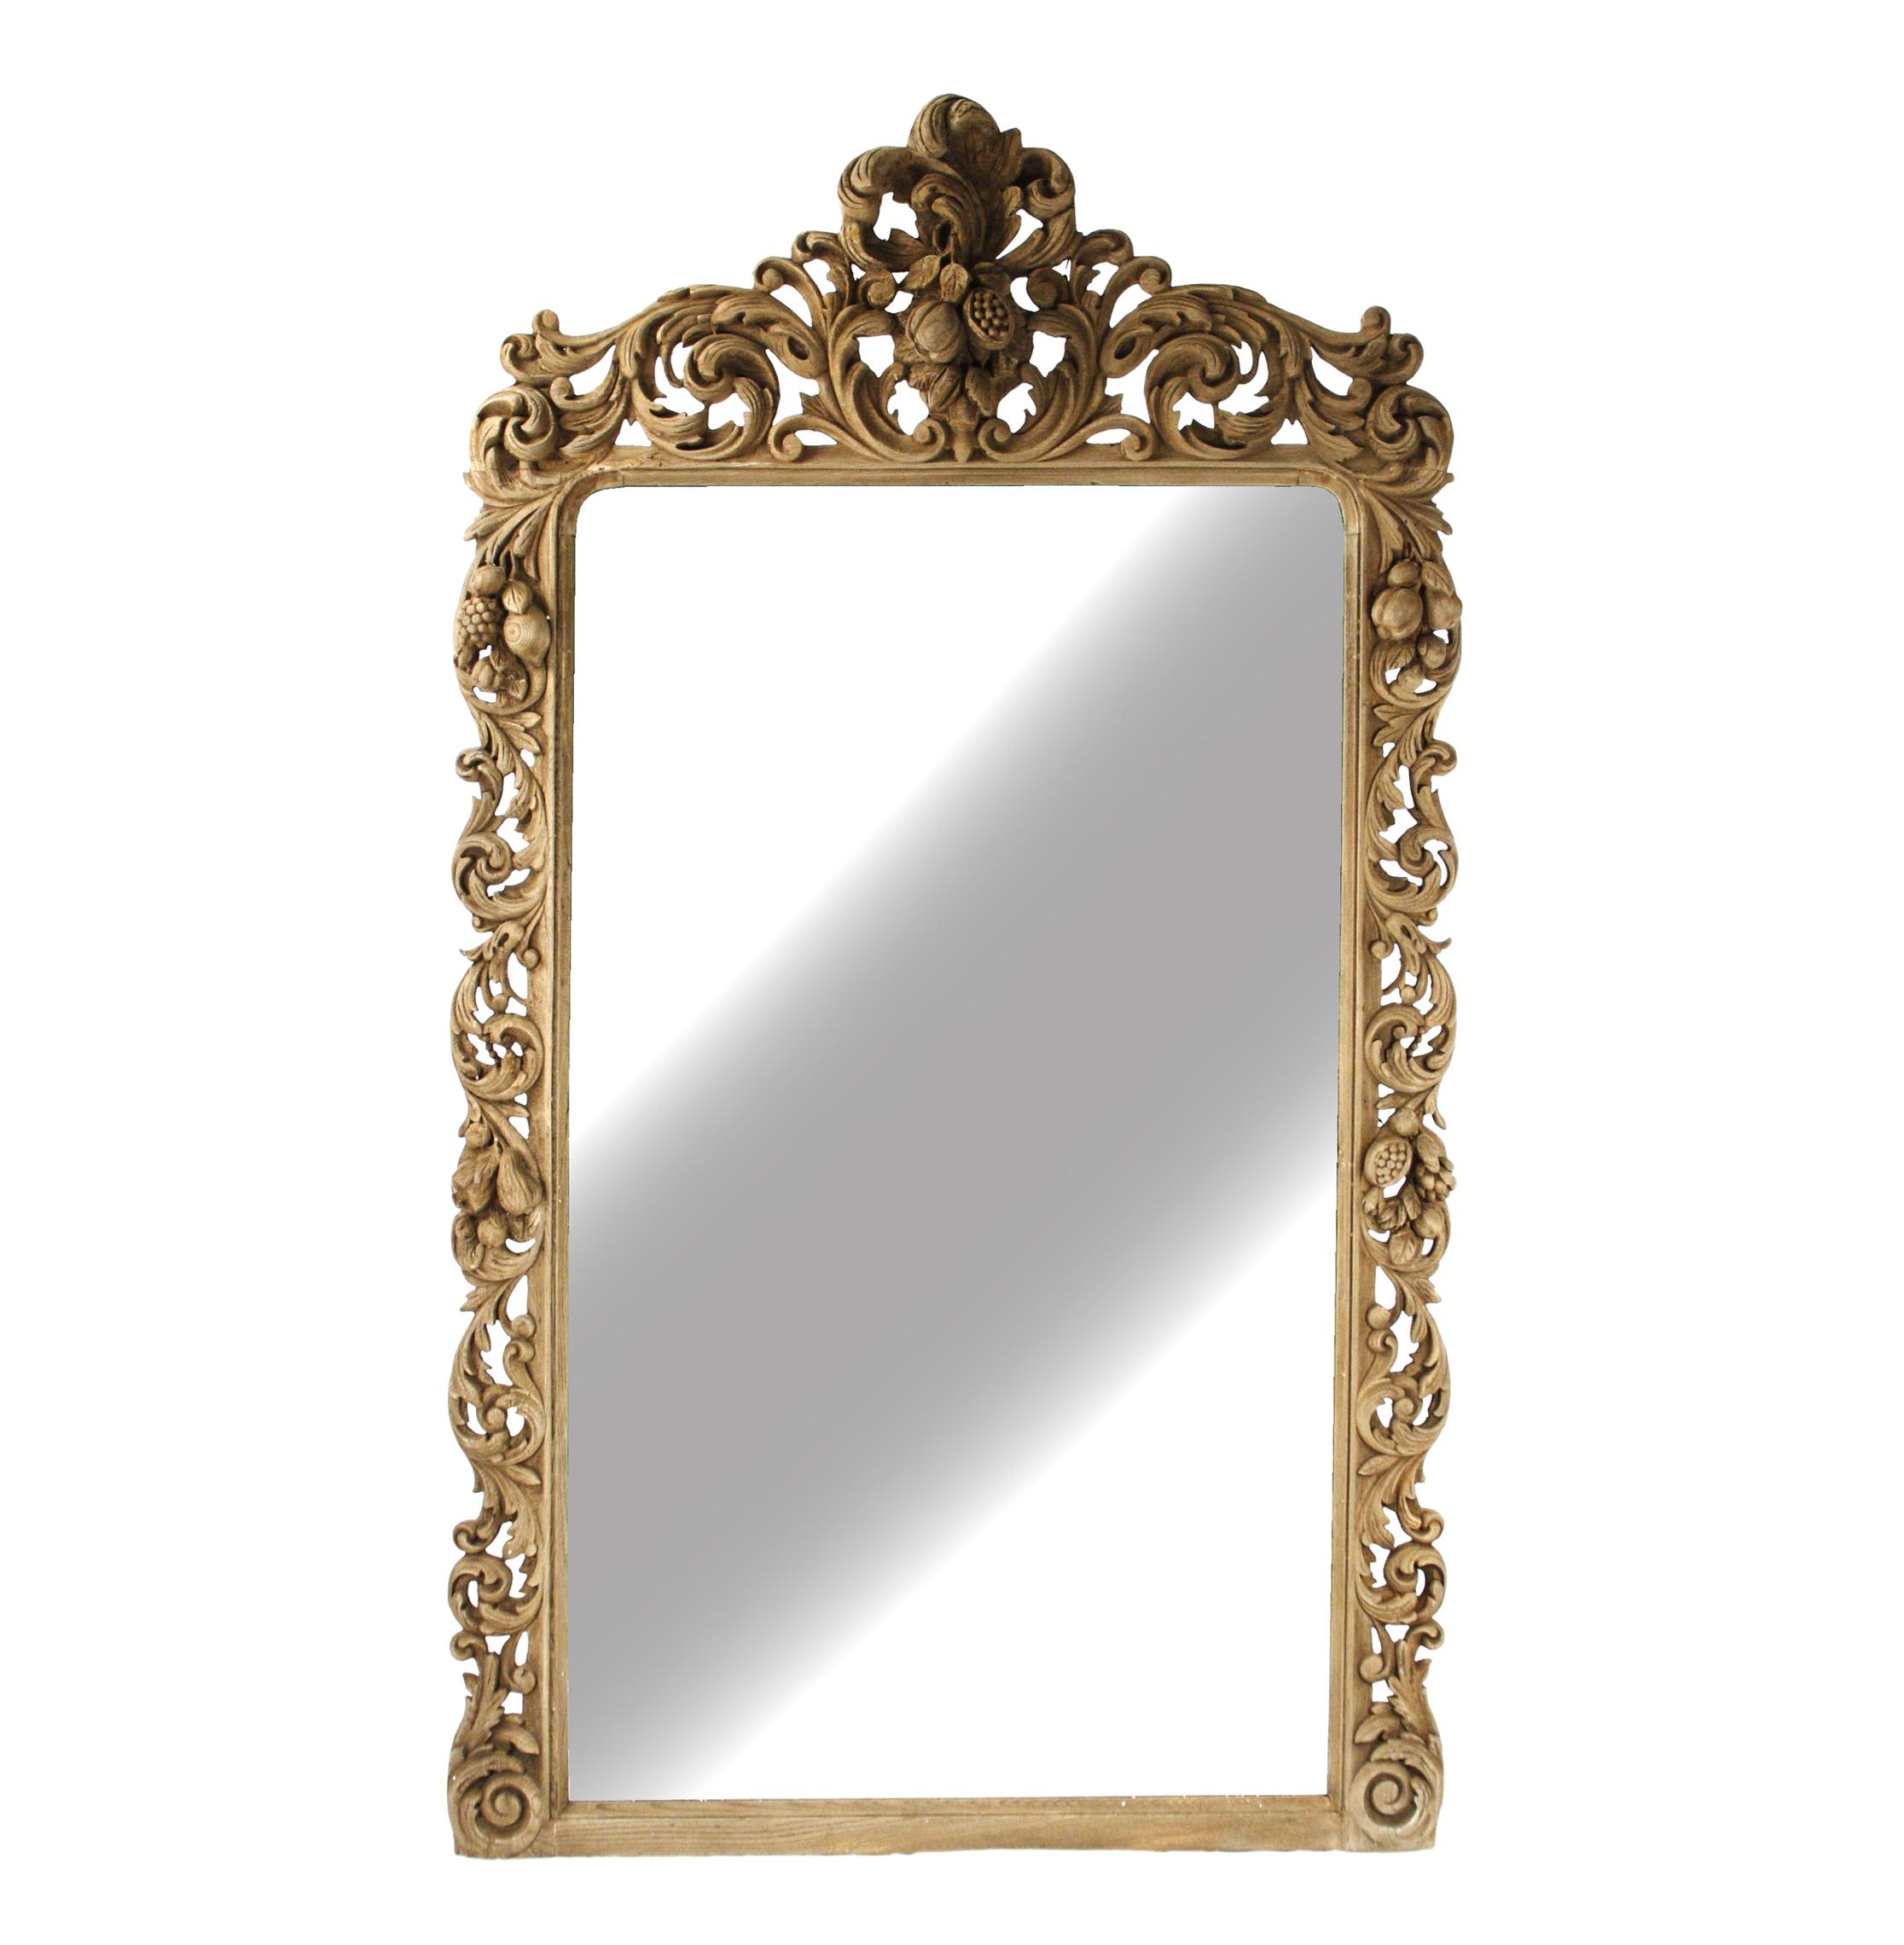 Designer Floor Mirrors - Eclectic Floor Mirrors | Kathy Kuo Home